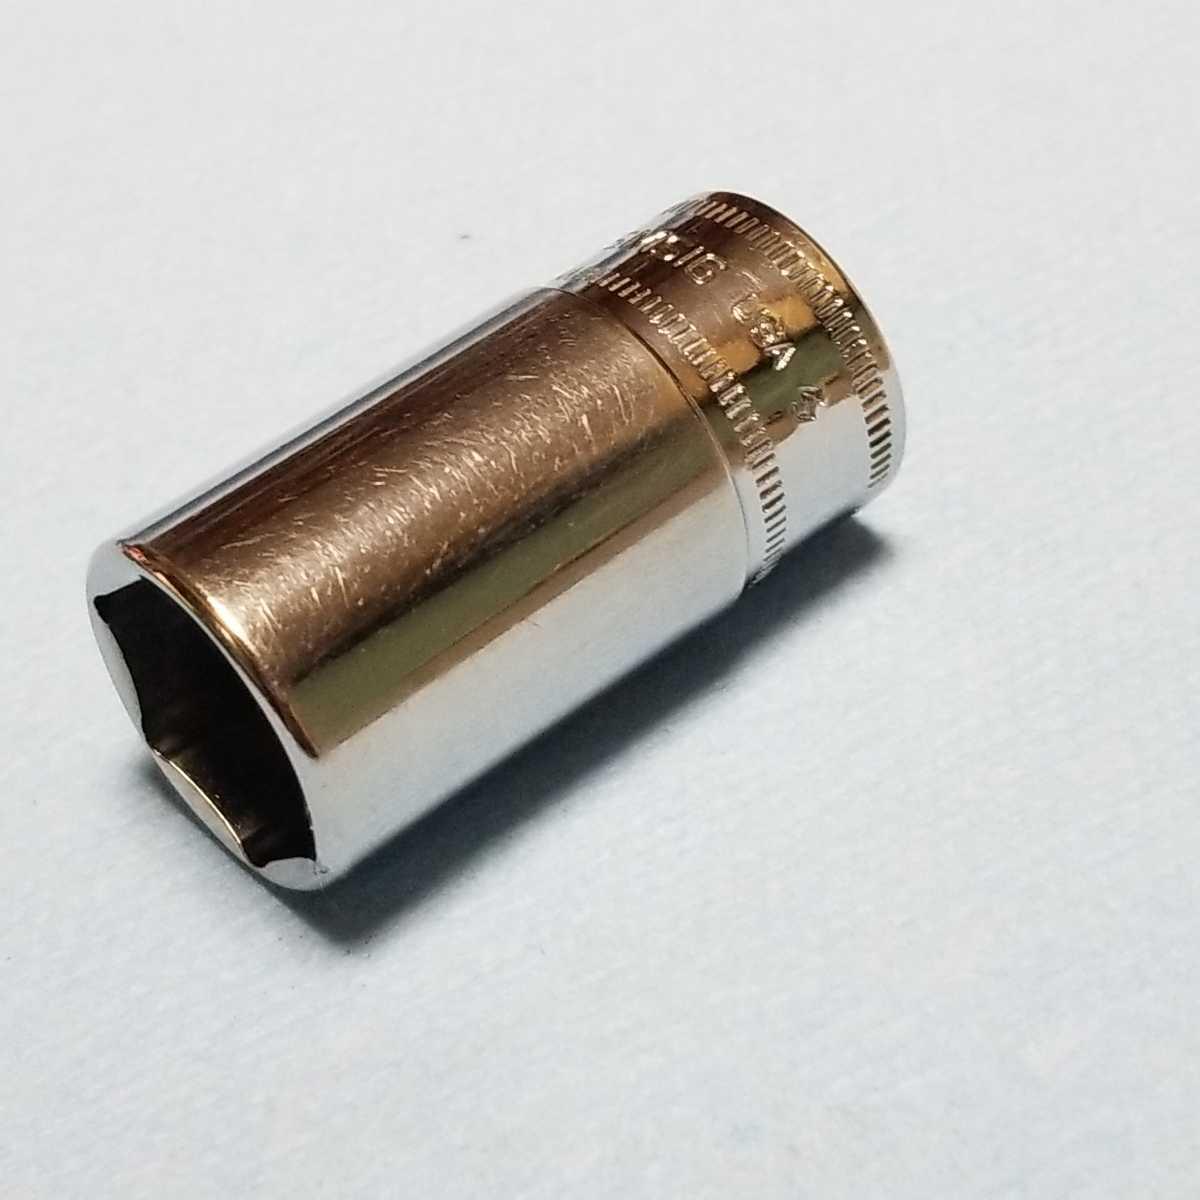 16mm 3/8 セミディープ スナップオン FSMS16 (6角) 中古品 美品 保管品 SNAPON SNAP-ON セミディープソケット ソケット 送料無料 _画像5